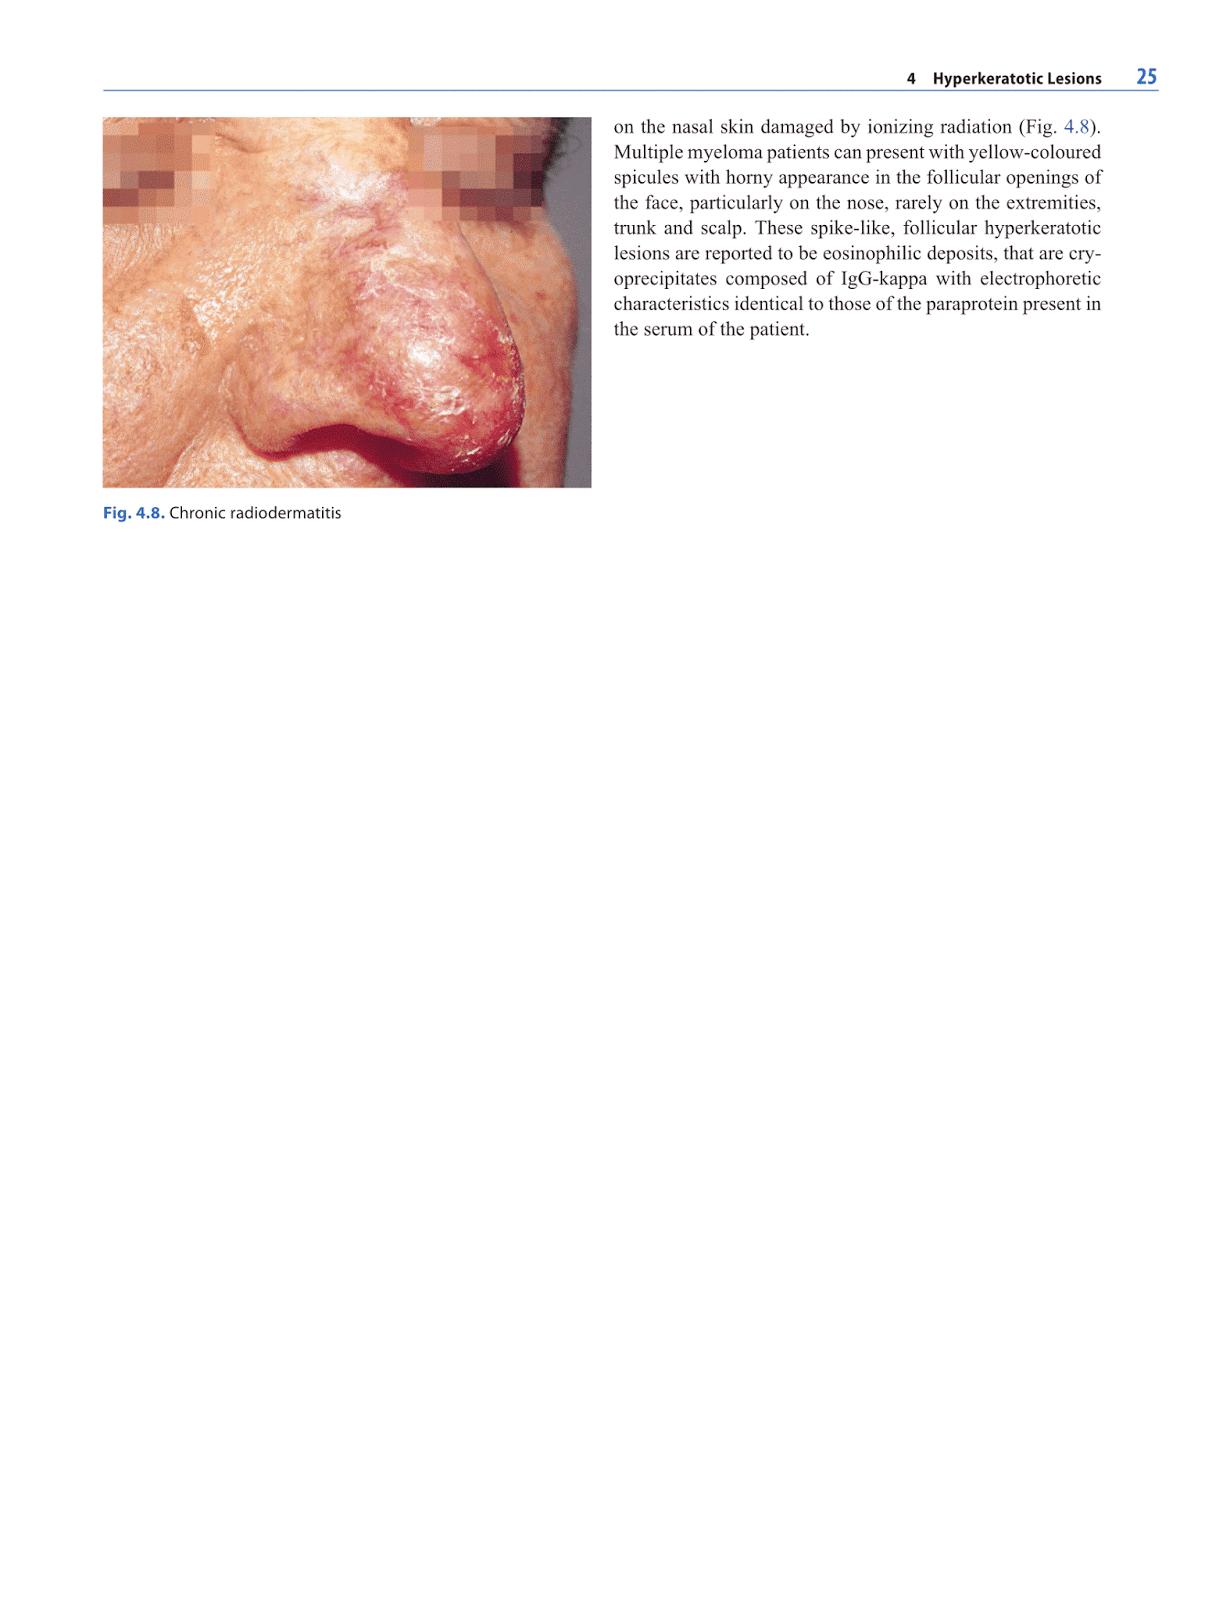 Otolaryngology by Alexandros G Sfakianakis: Lesions of the Nose